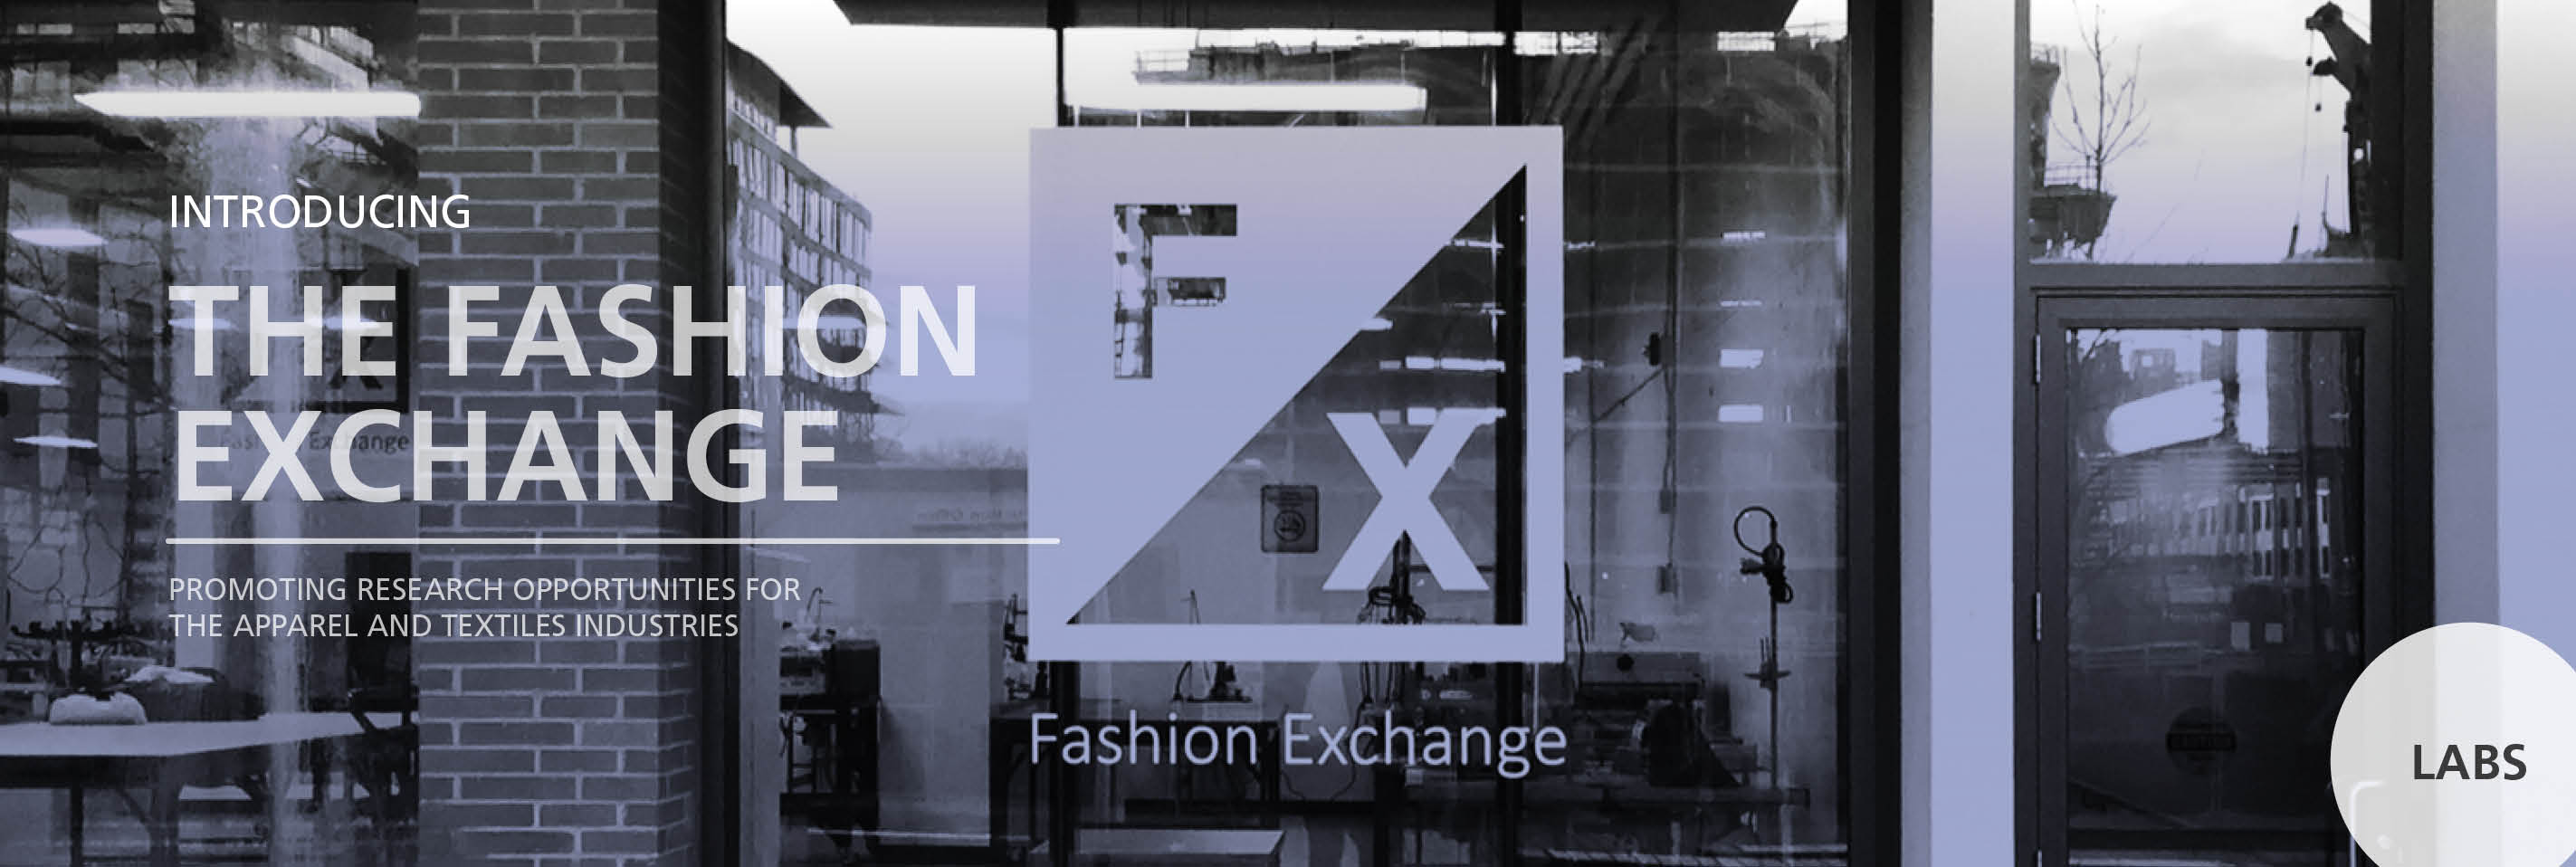 The Fashion Exchange